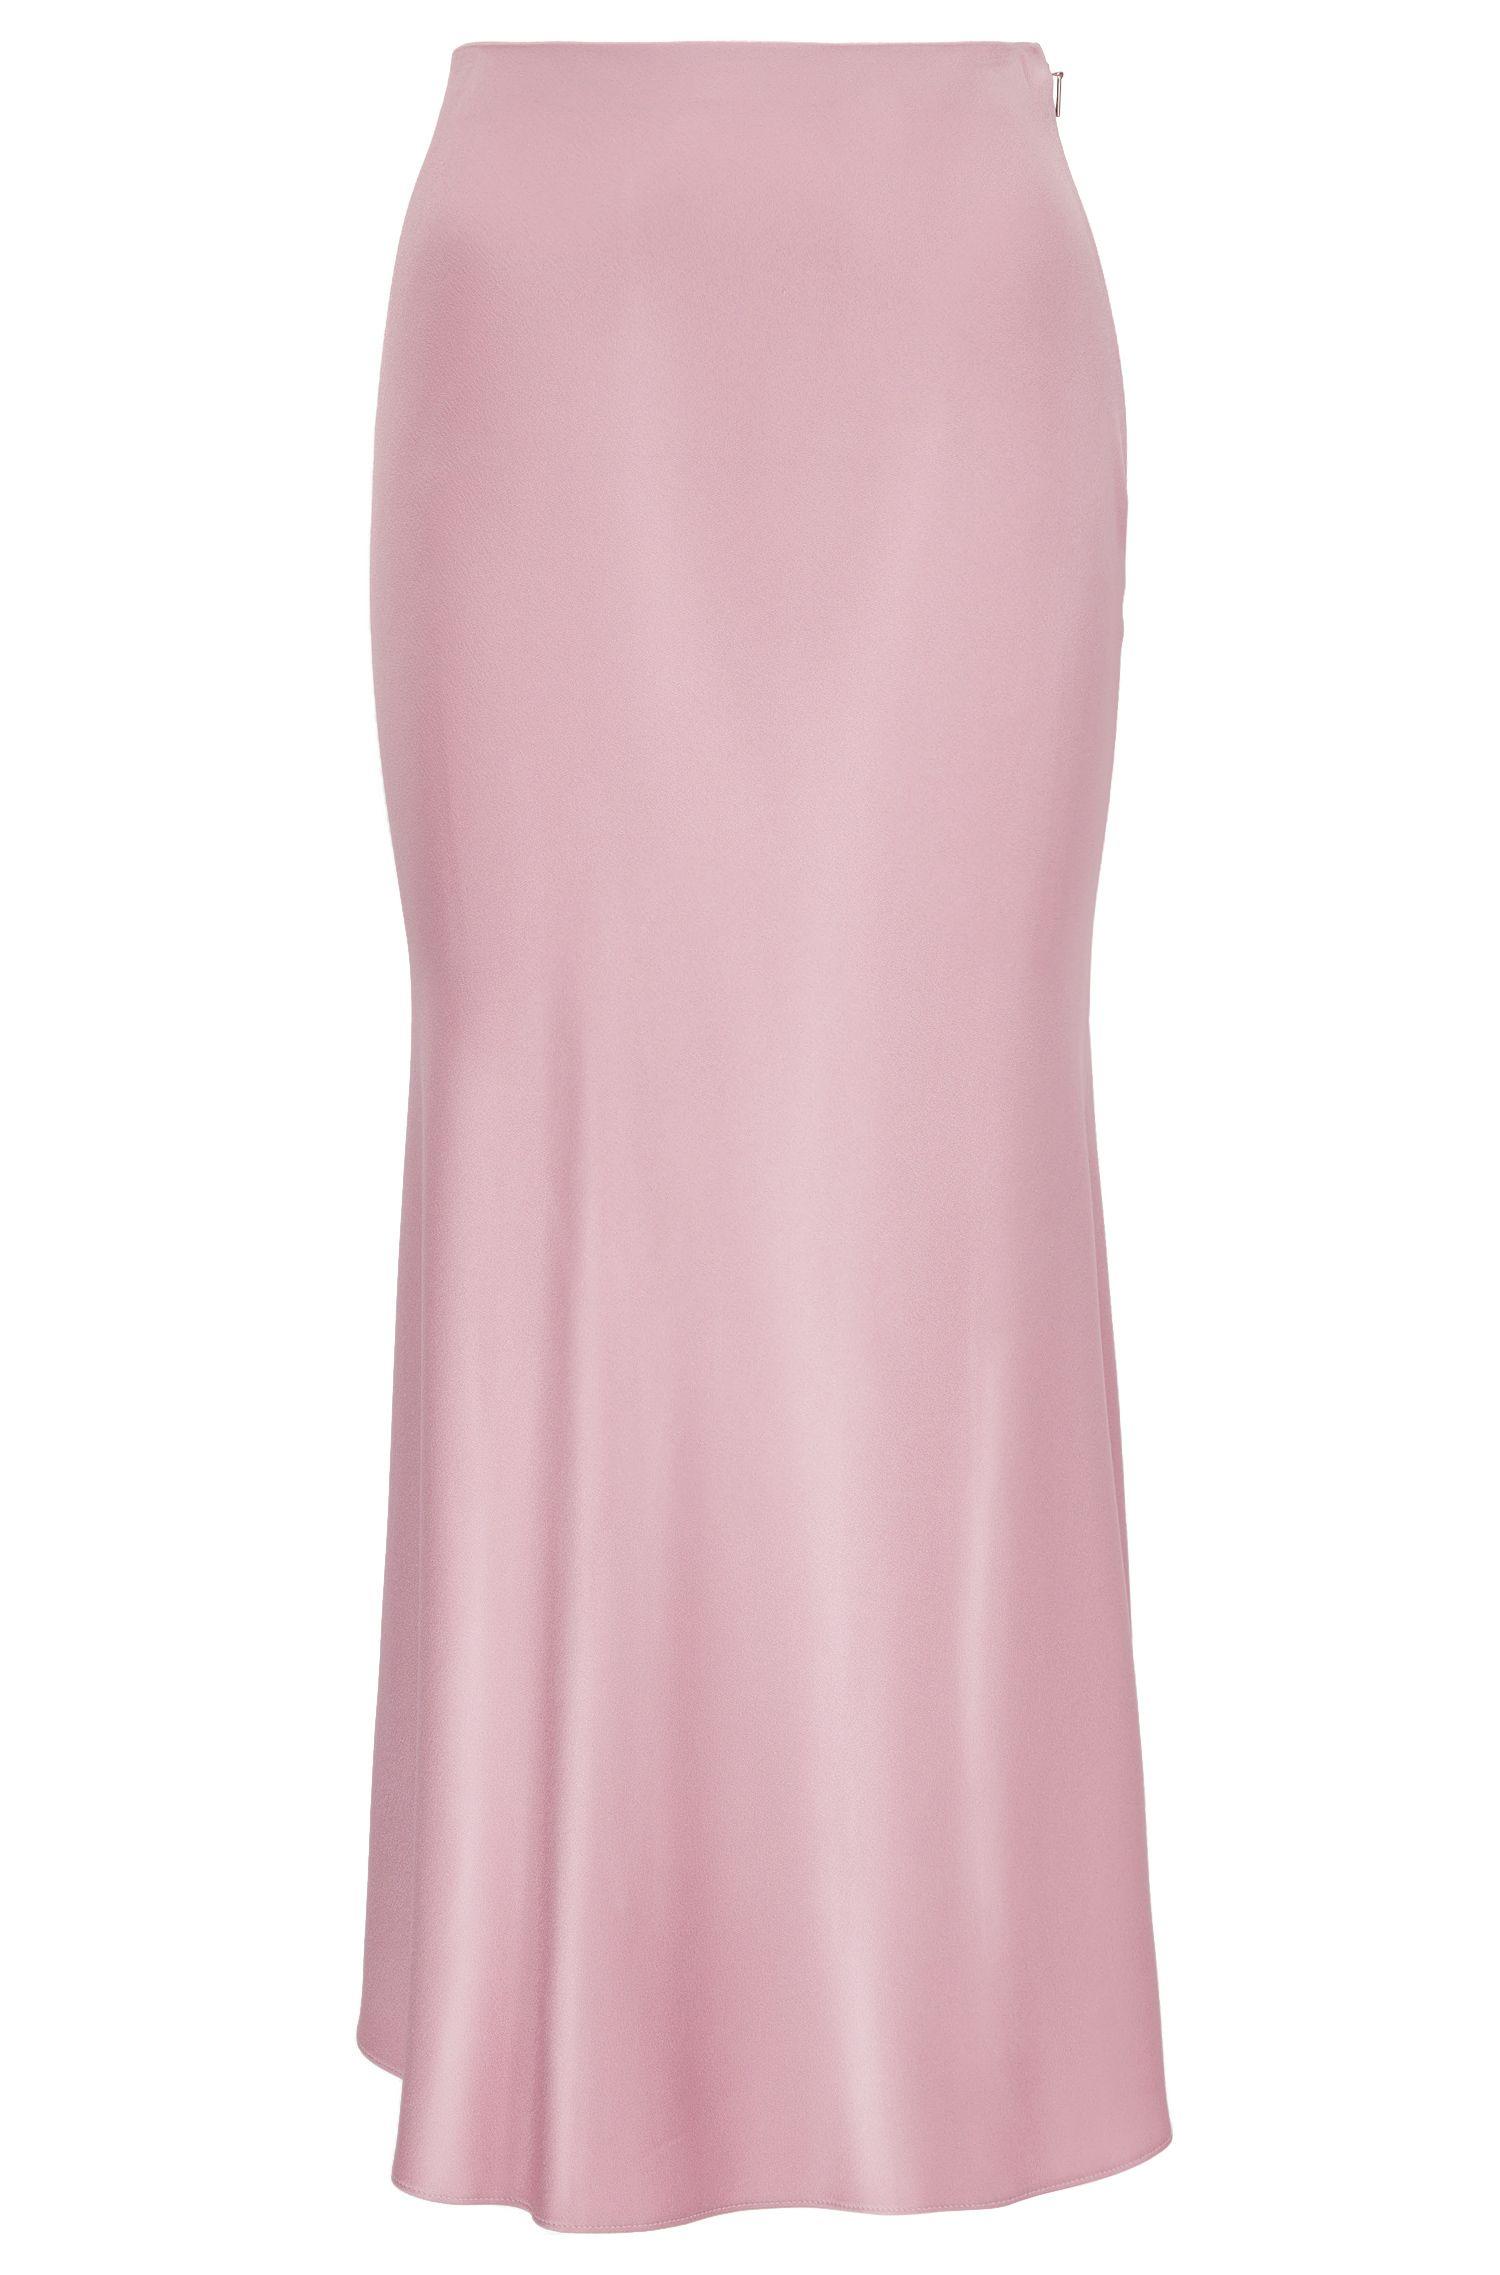 A-line skirt in fluid fabric